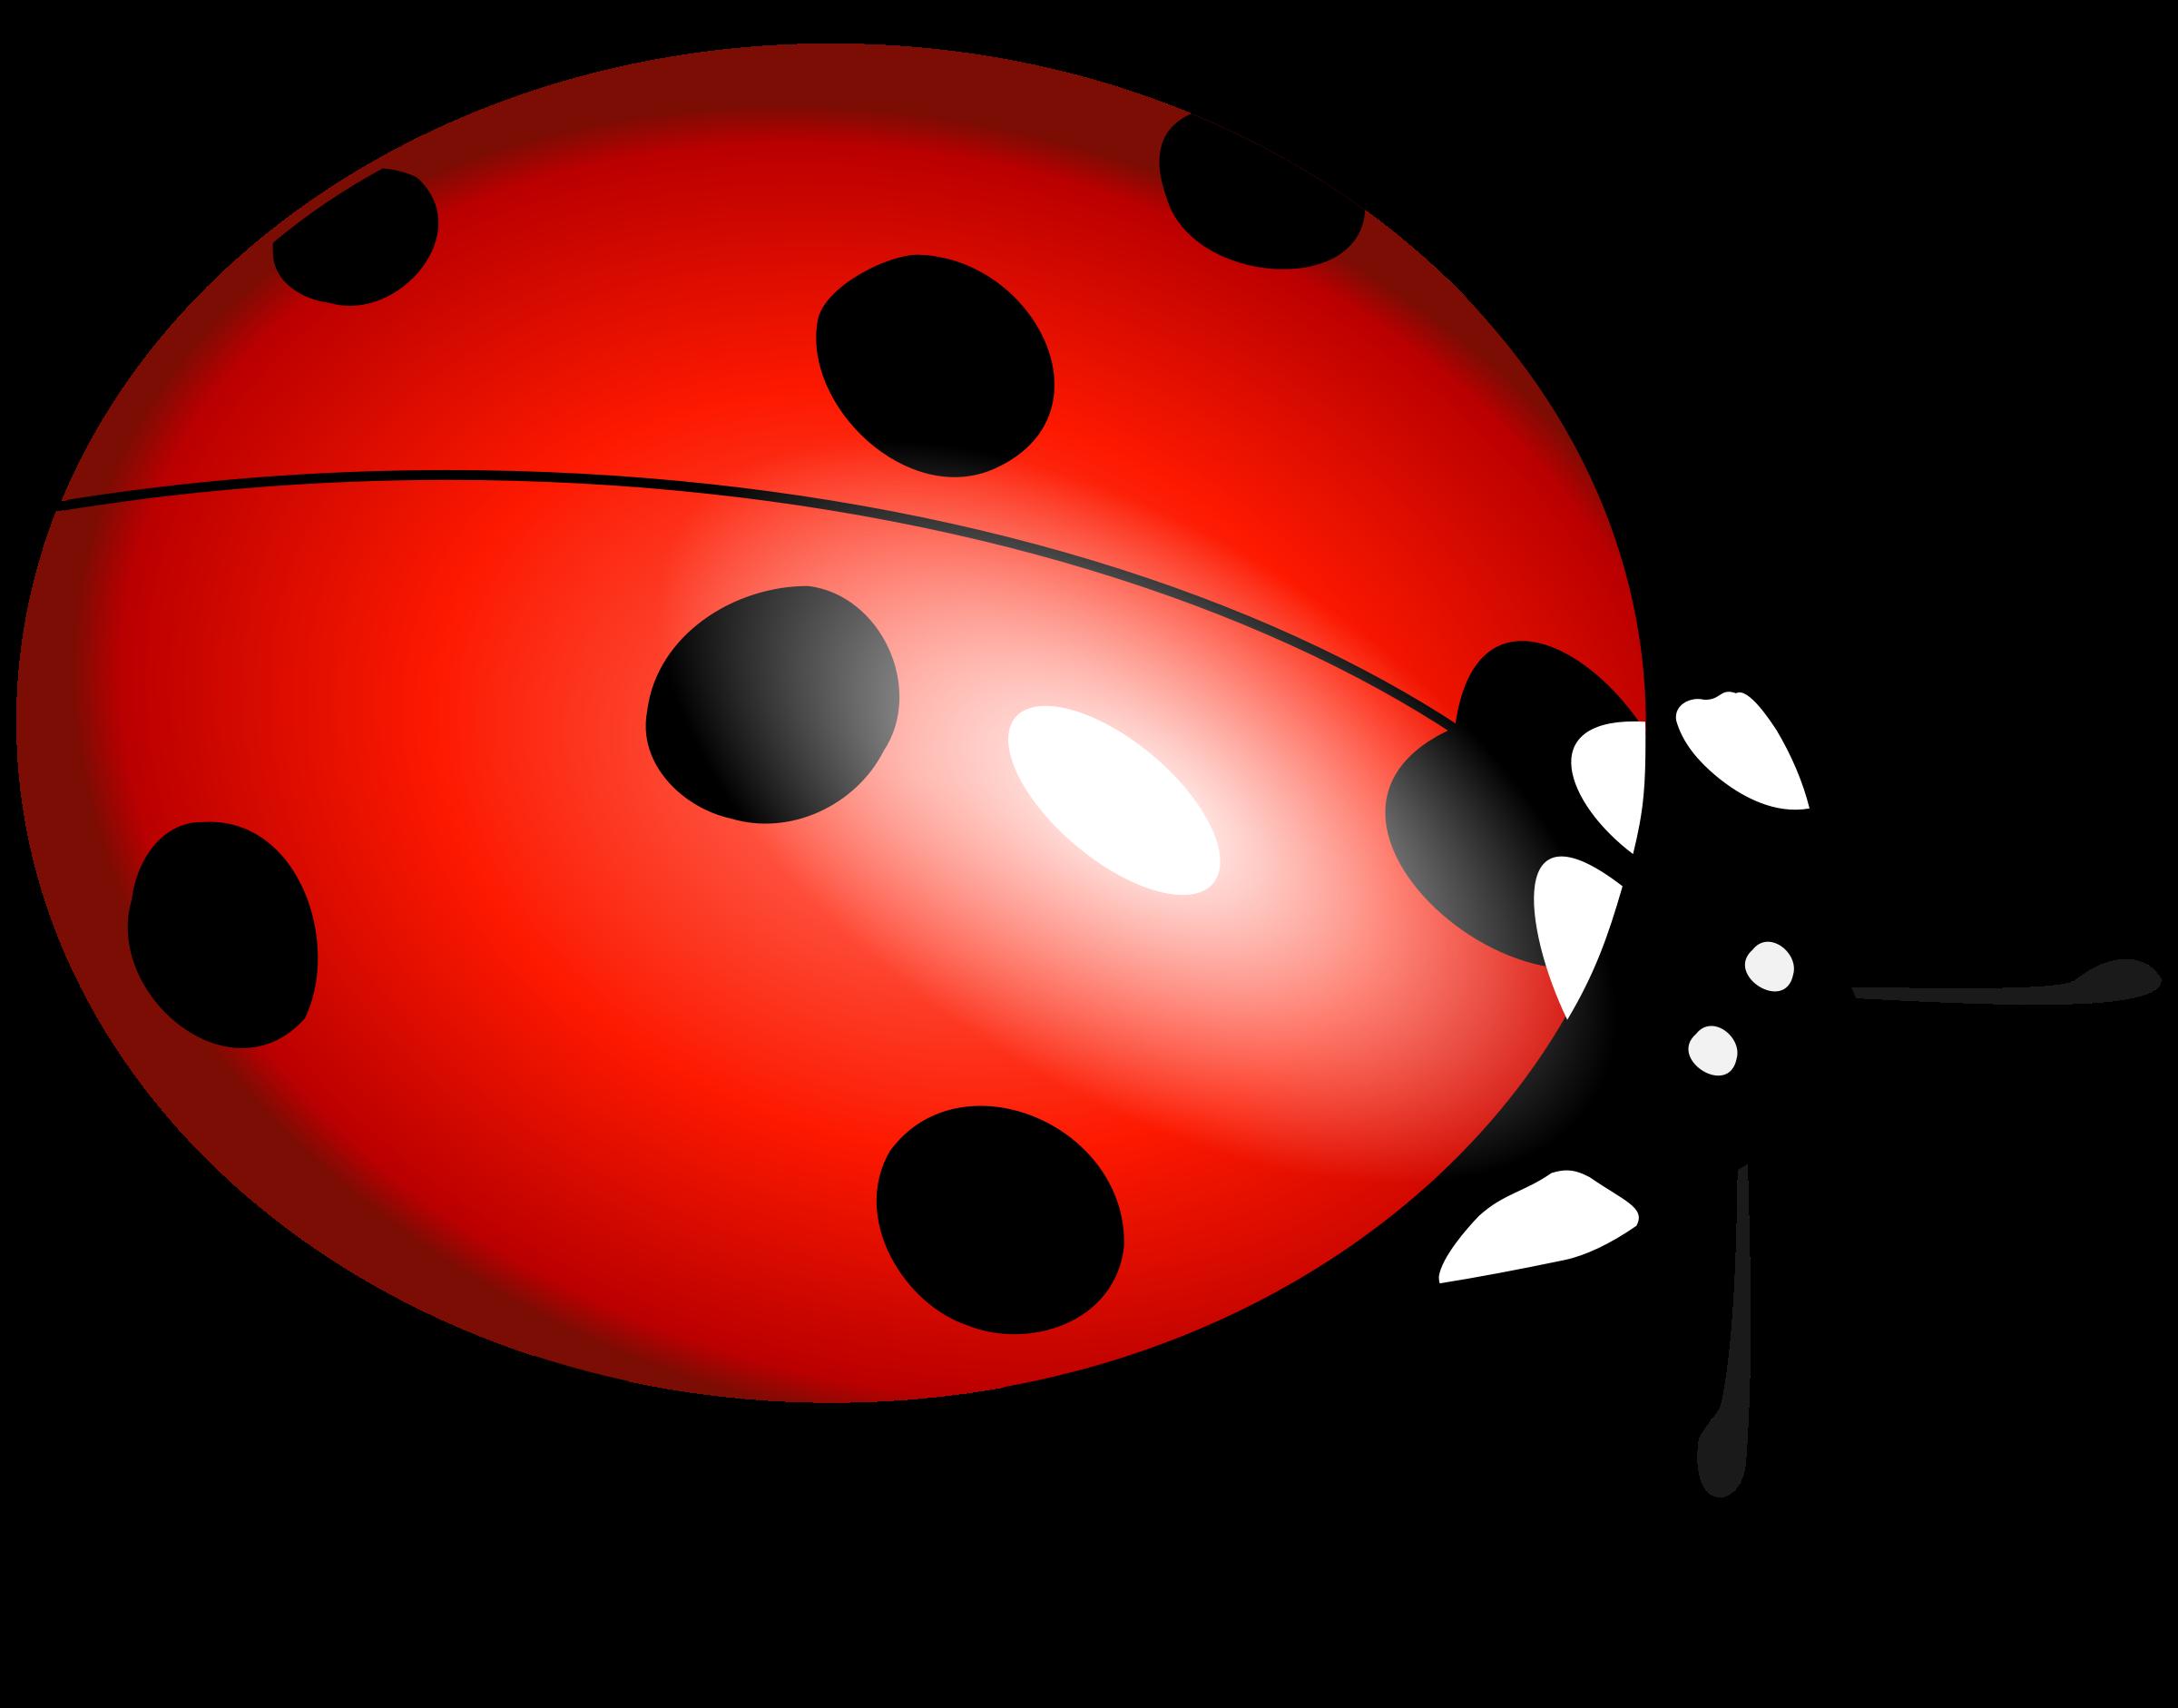 ladybug clipart file 14374 transparentpng rh transparentpng com ladybug clipart images ladybug clipart black and white